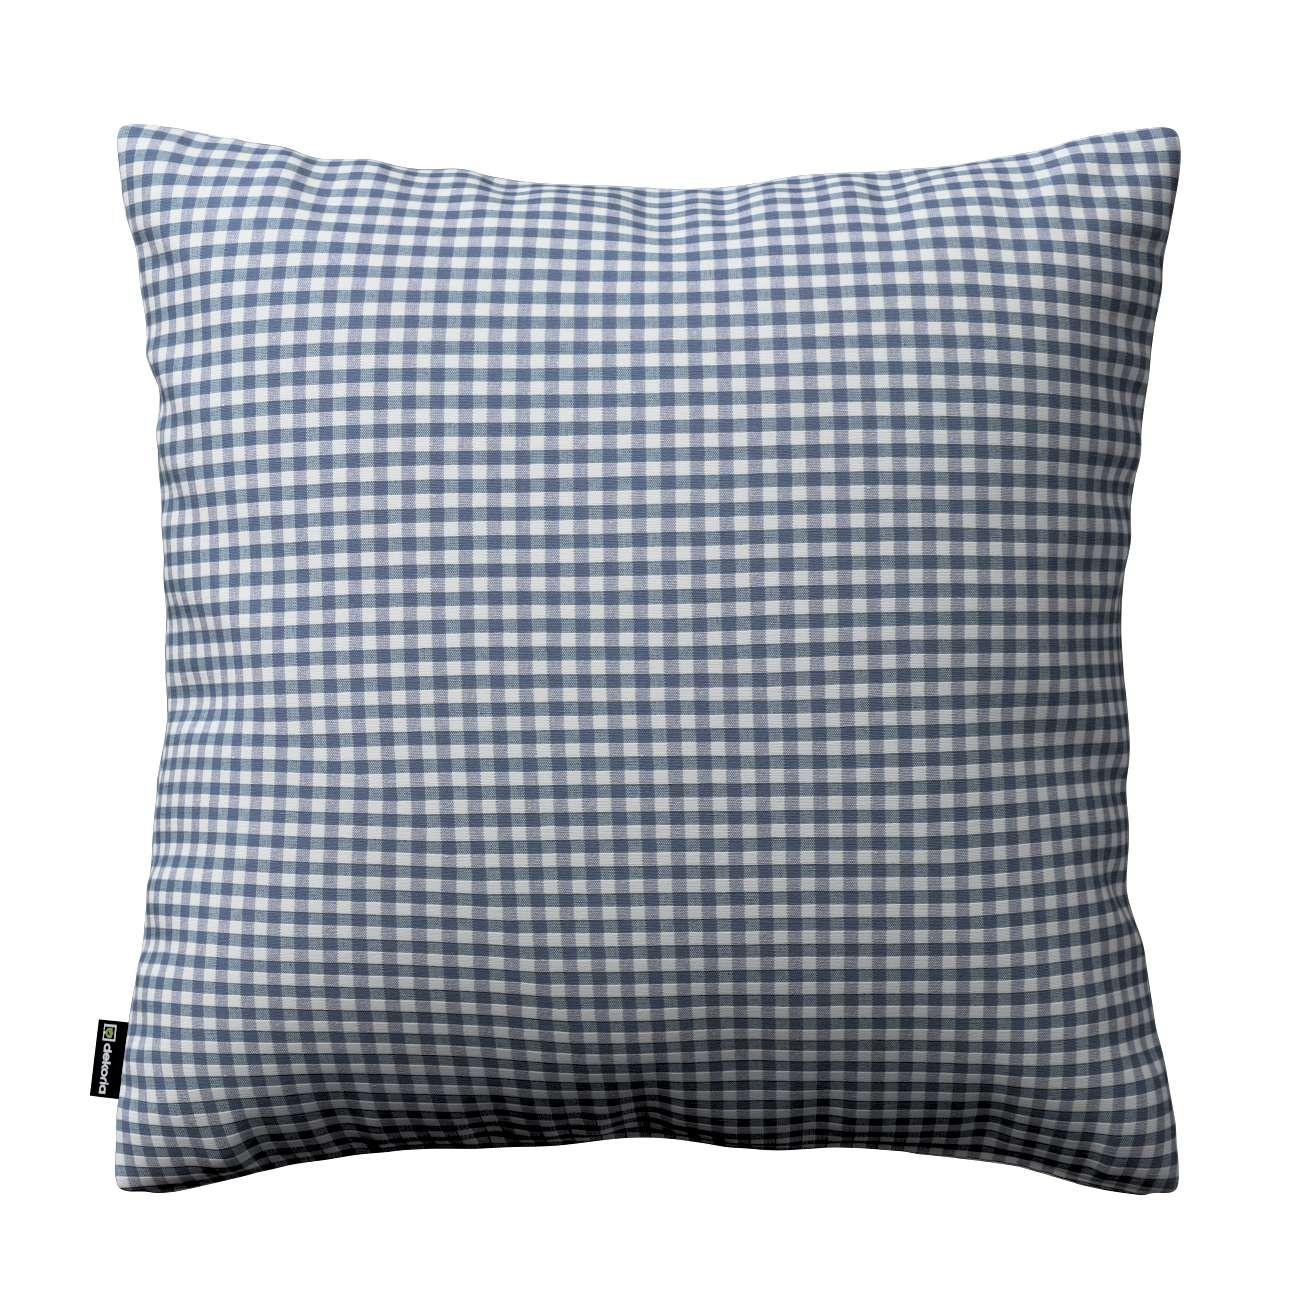 Kinga cushion cover in collection Quadro, fabric: 136-00